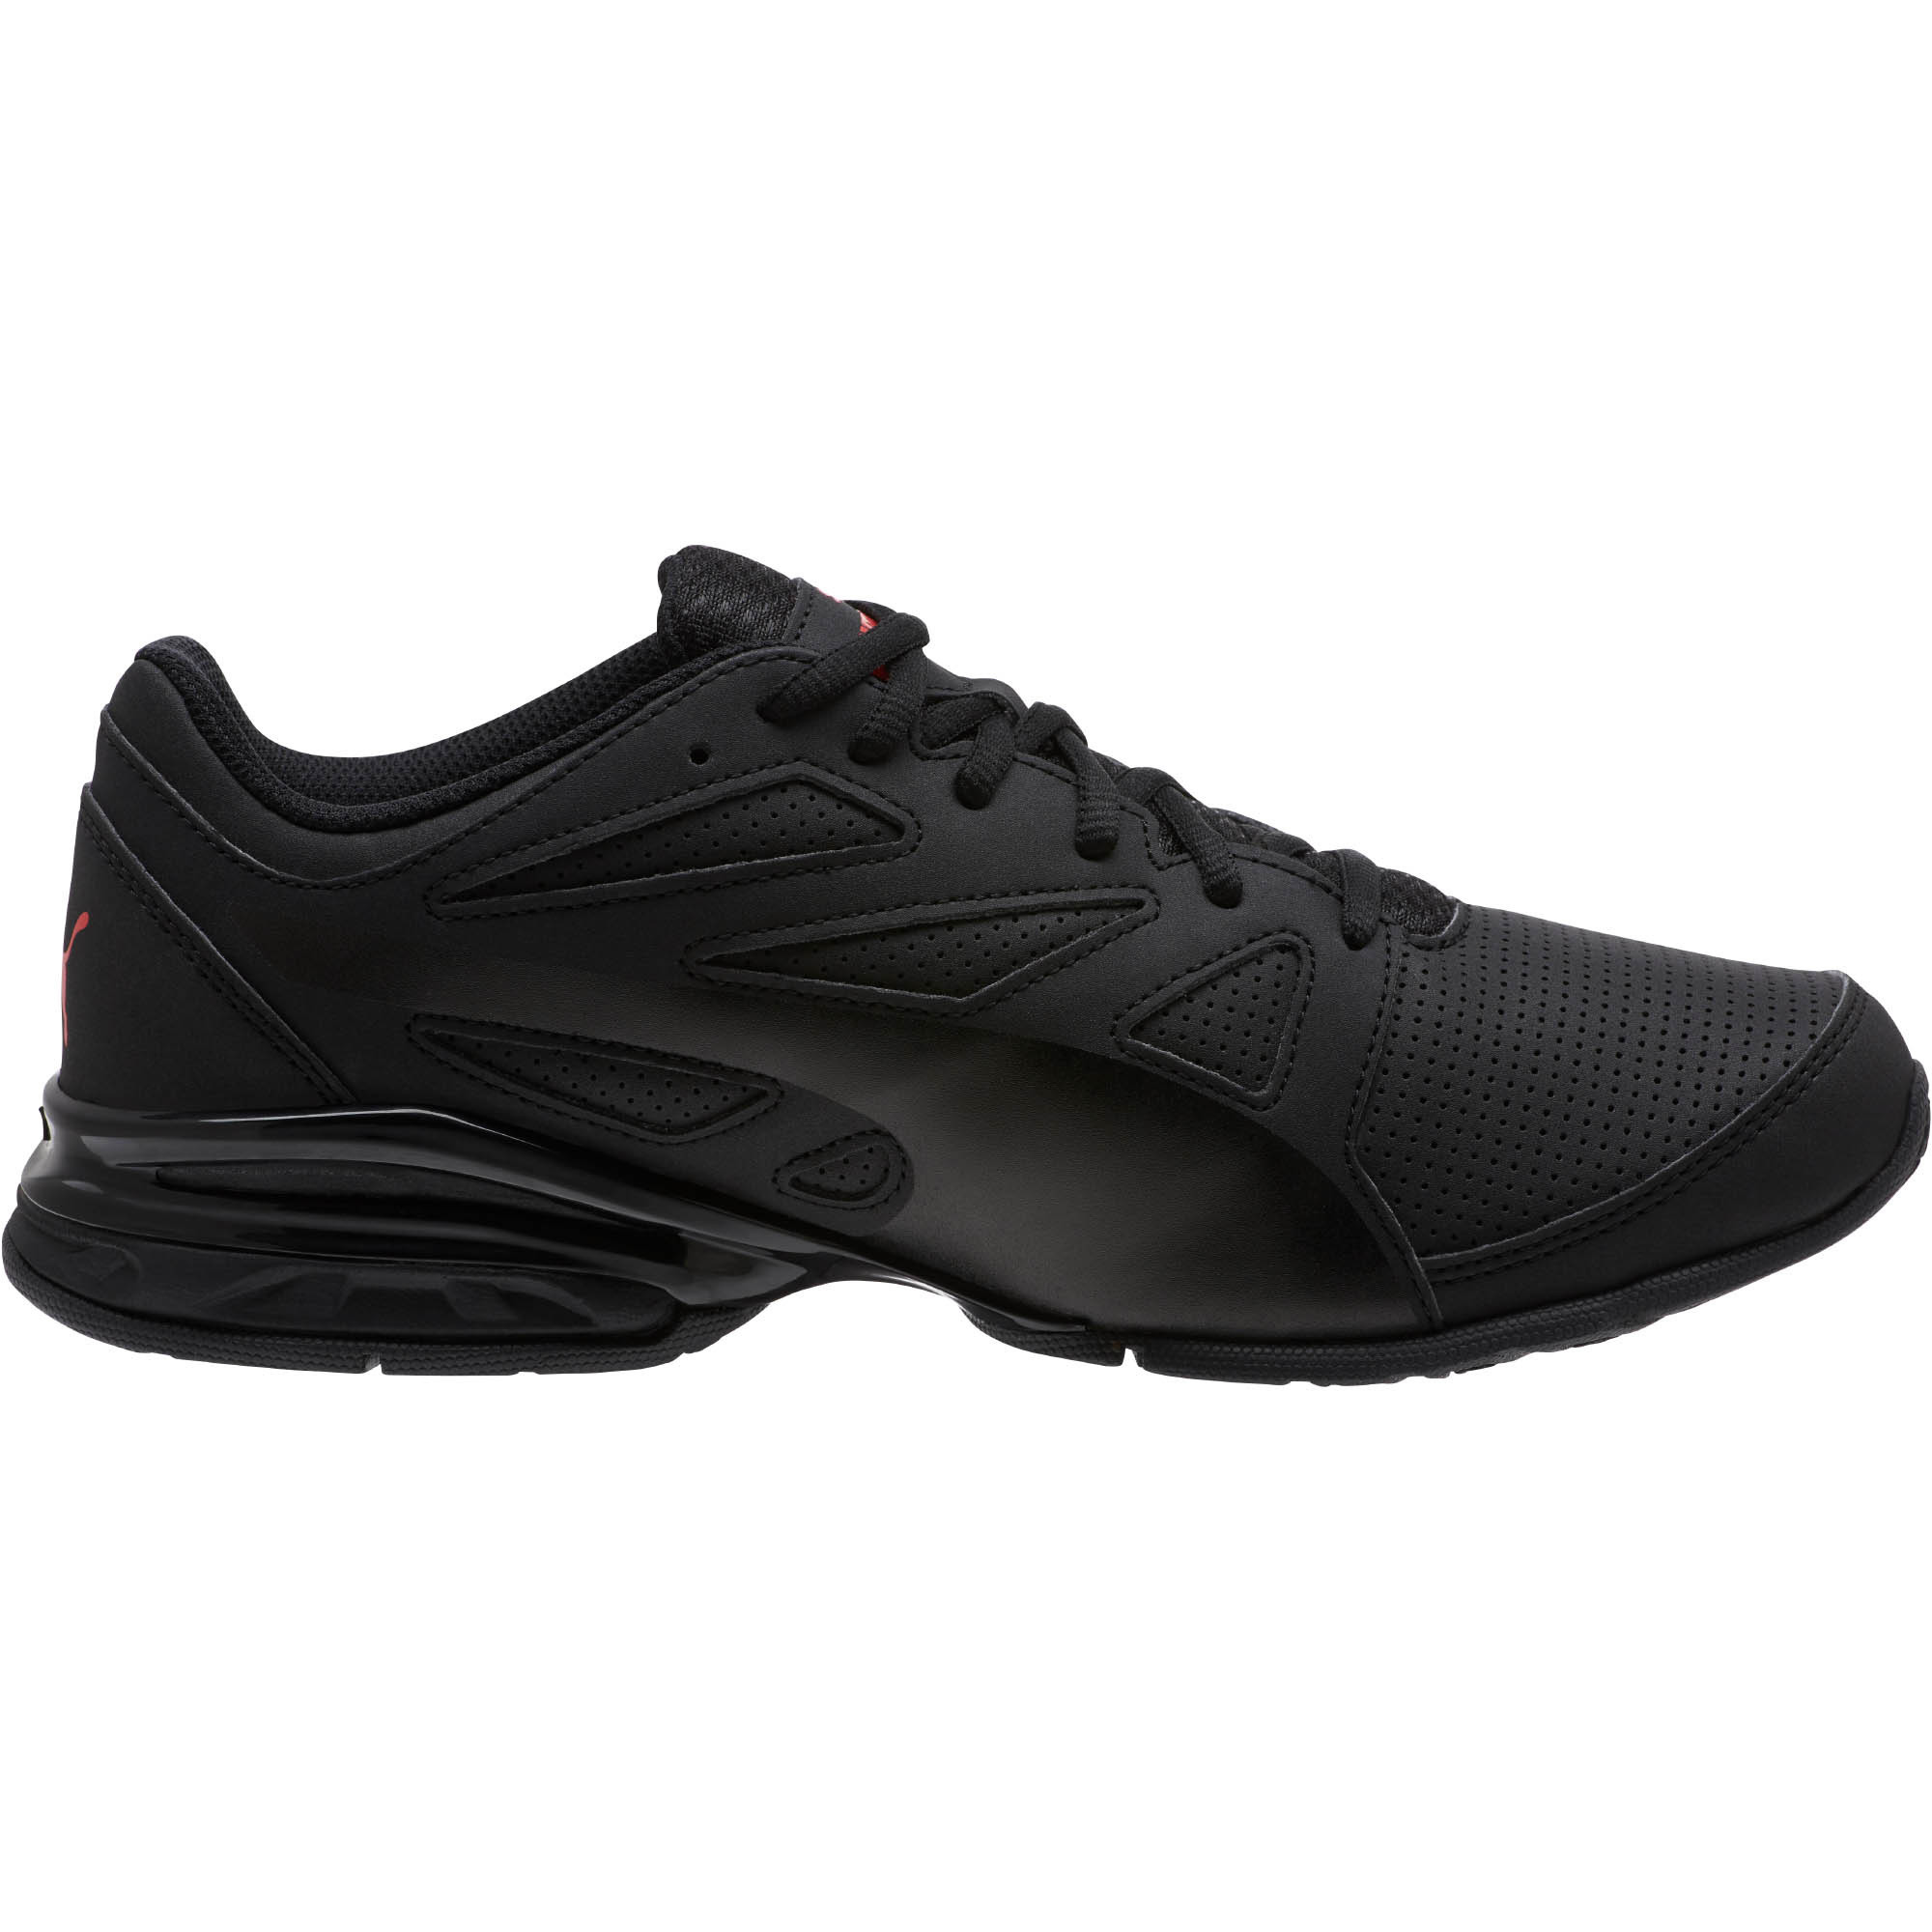 PUMA-Tazon-Modern-SL-FM-Men-039-s-Sneakers-Men-Shoe-Running thumbnail 5